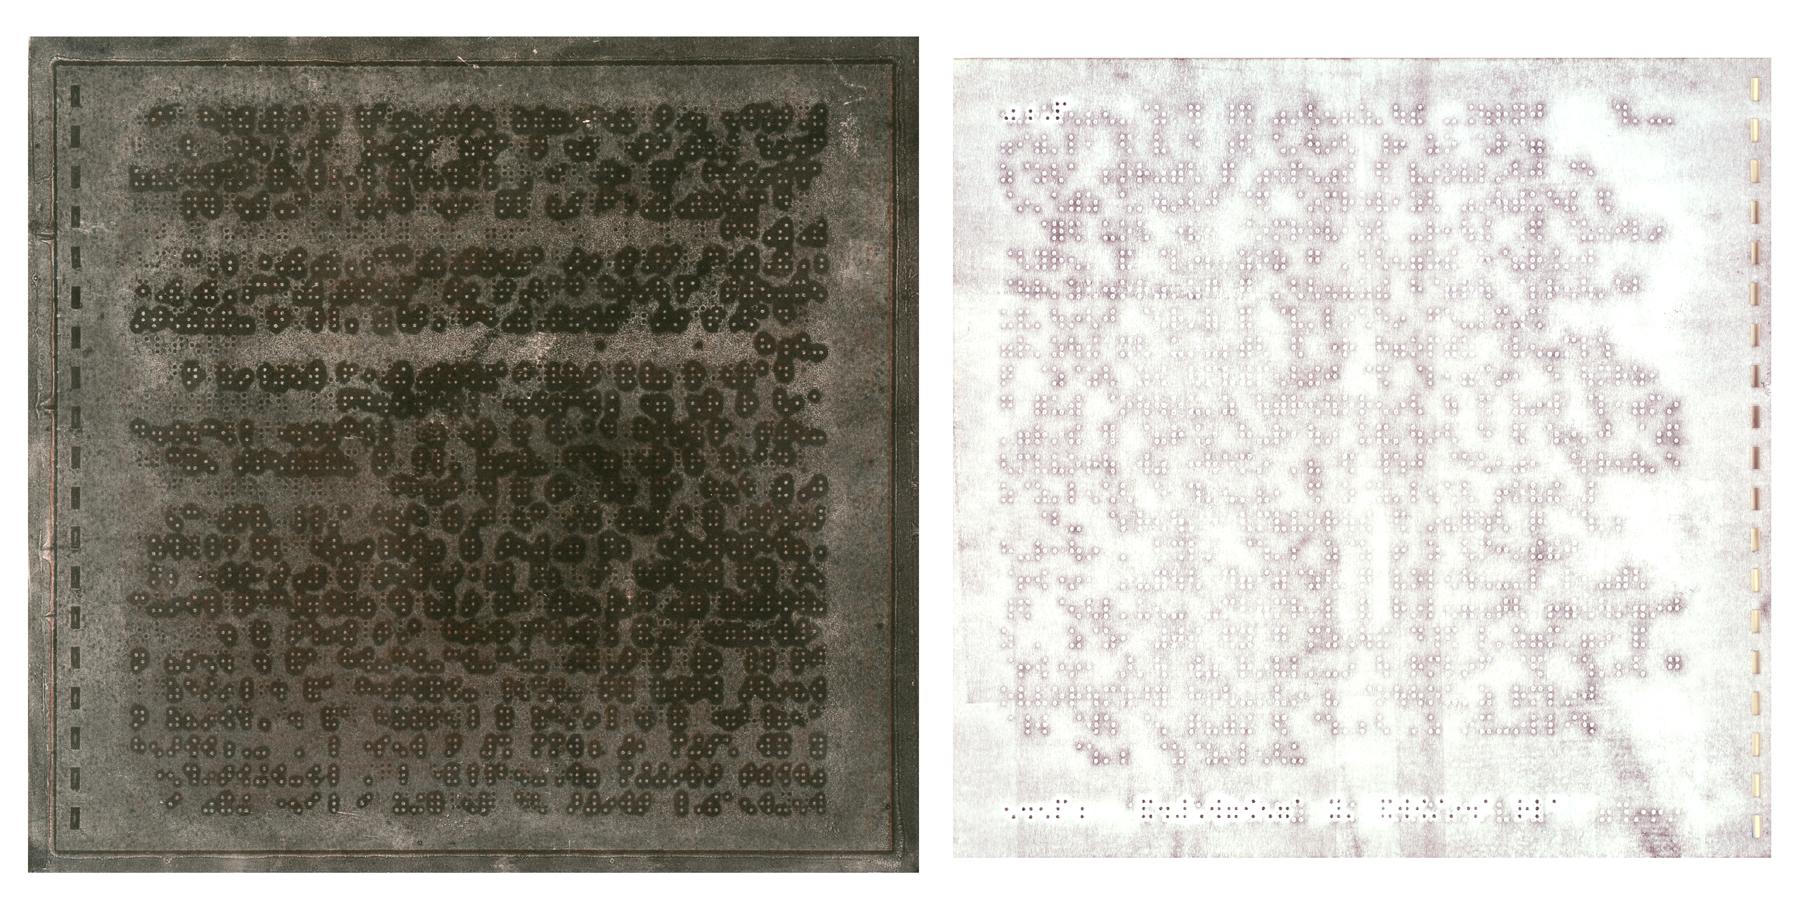 Mary Kostman,  Cross Eyed , Monotype, 12x30